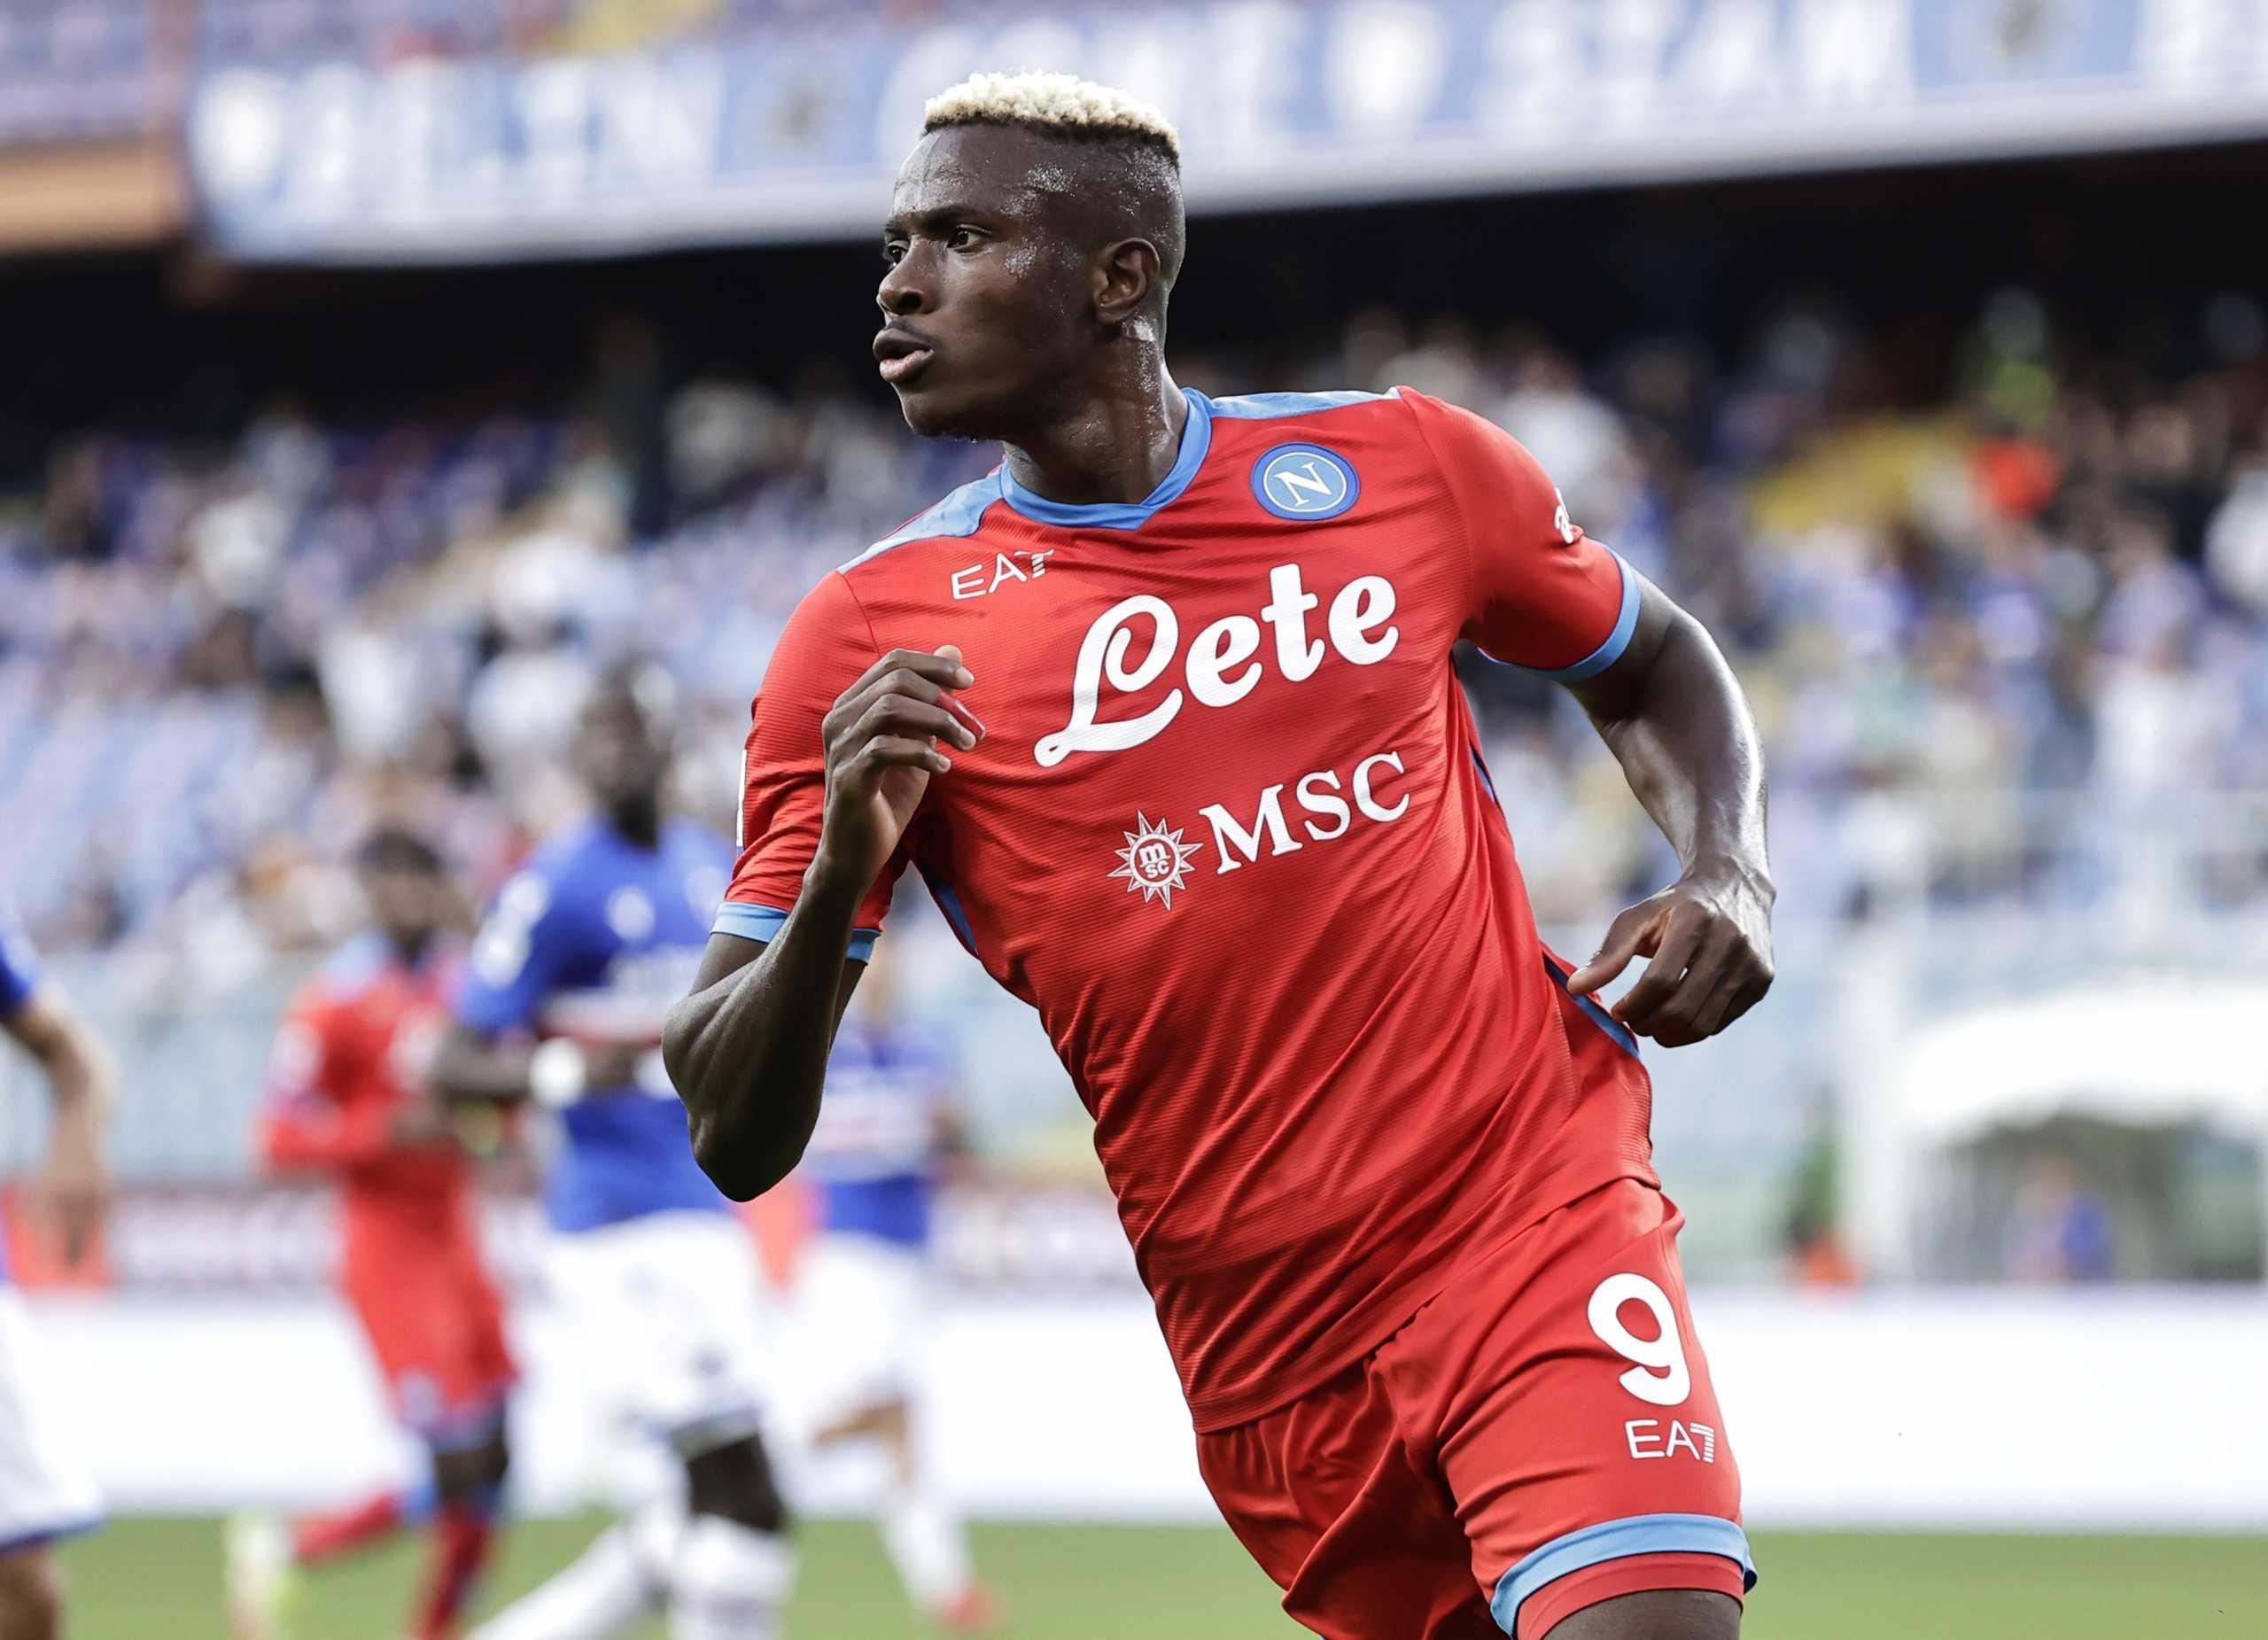 Serie A, Σαμπντόρια – Νάπολι 0-4: «Τρένο» οι Ναπολιτάνοι, αγωνίστηκε ο Κώστας Μανωλάς